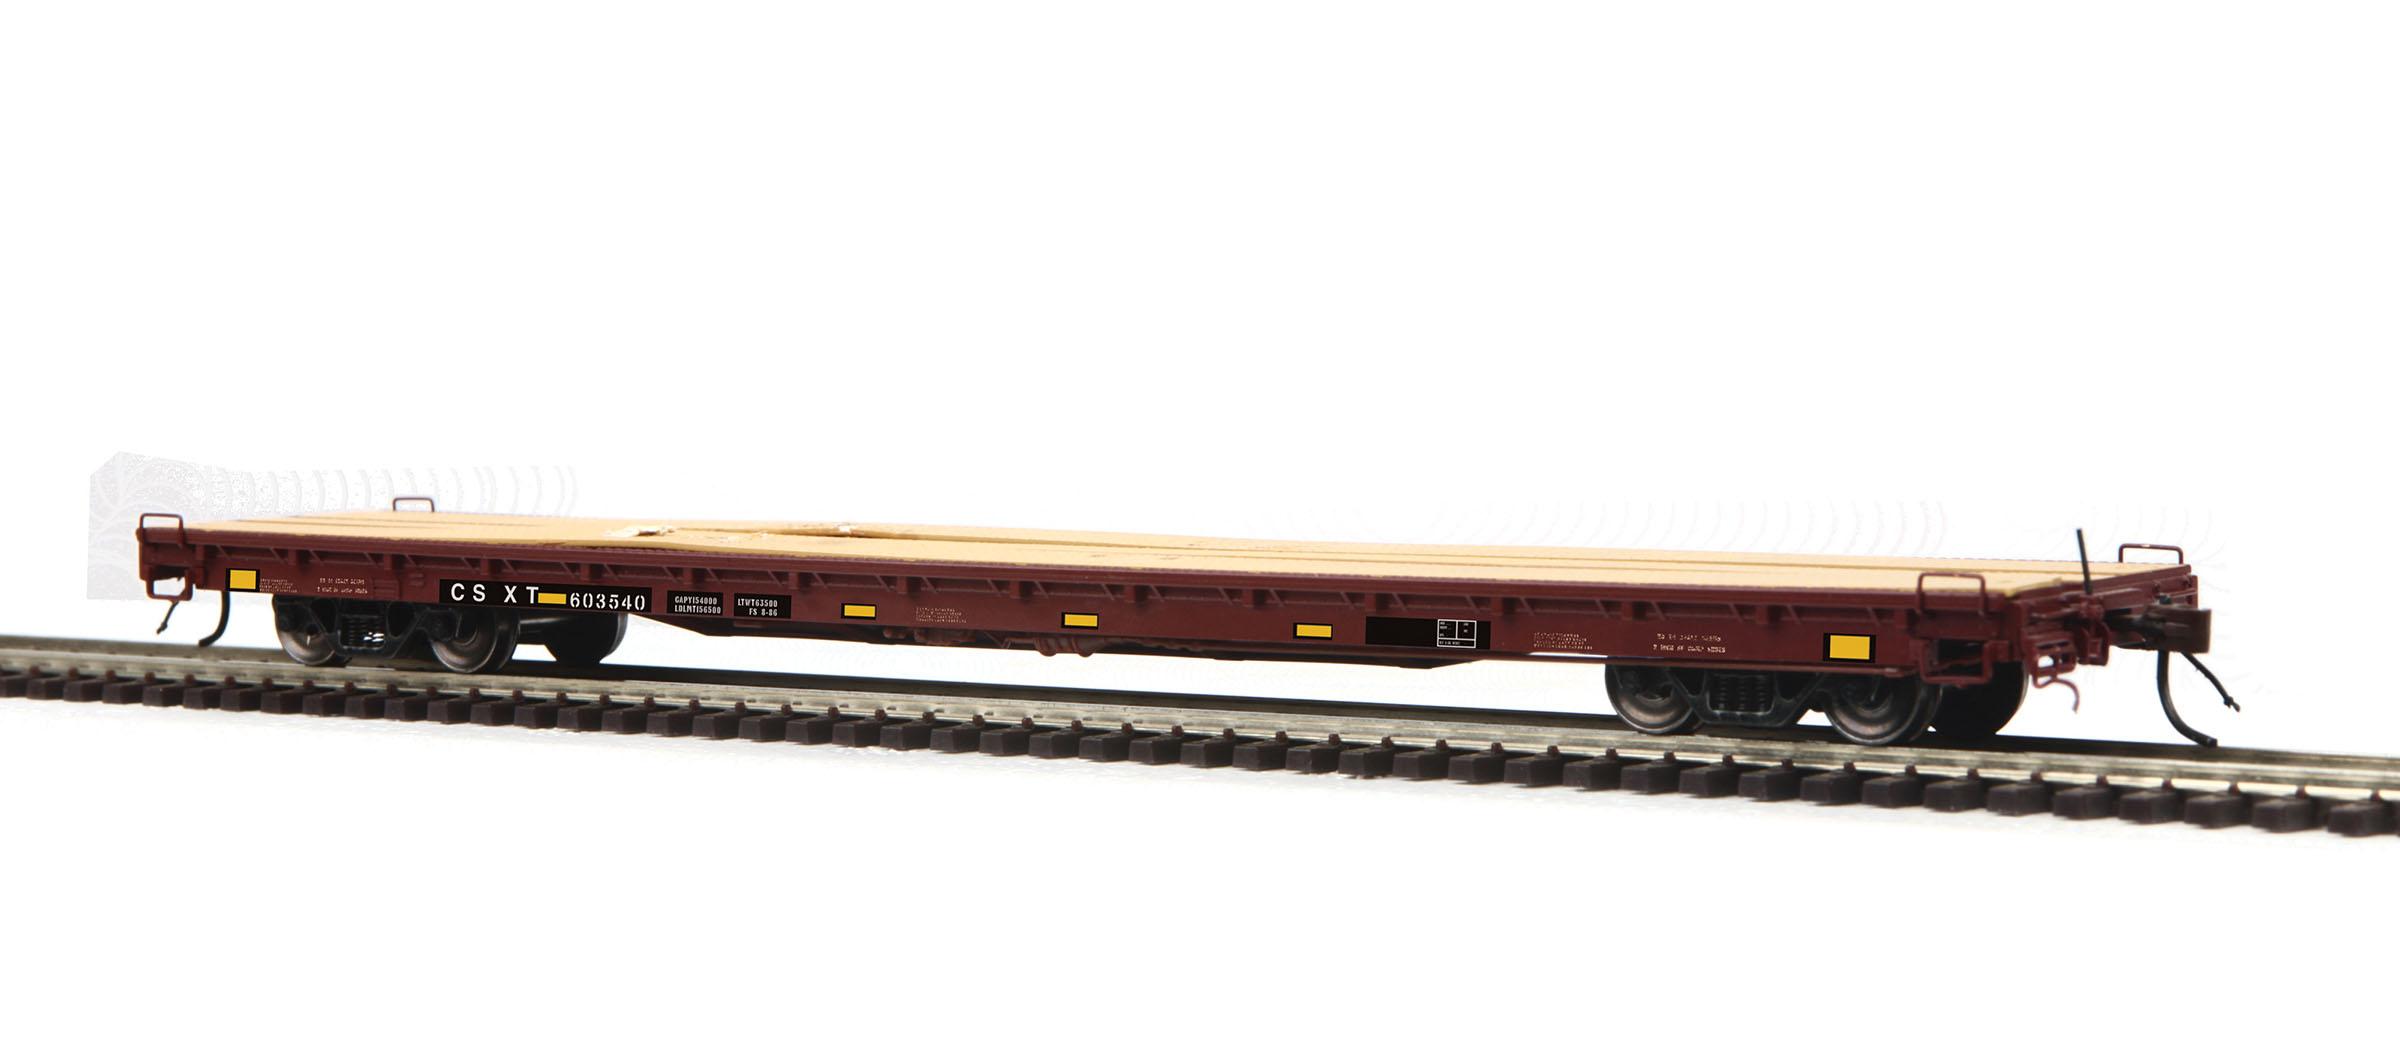 MTH 8098037 HO 60' Wood Deck Flatcar RTR CSX 603540 507-8098037